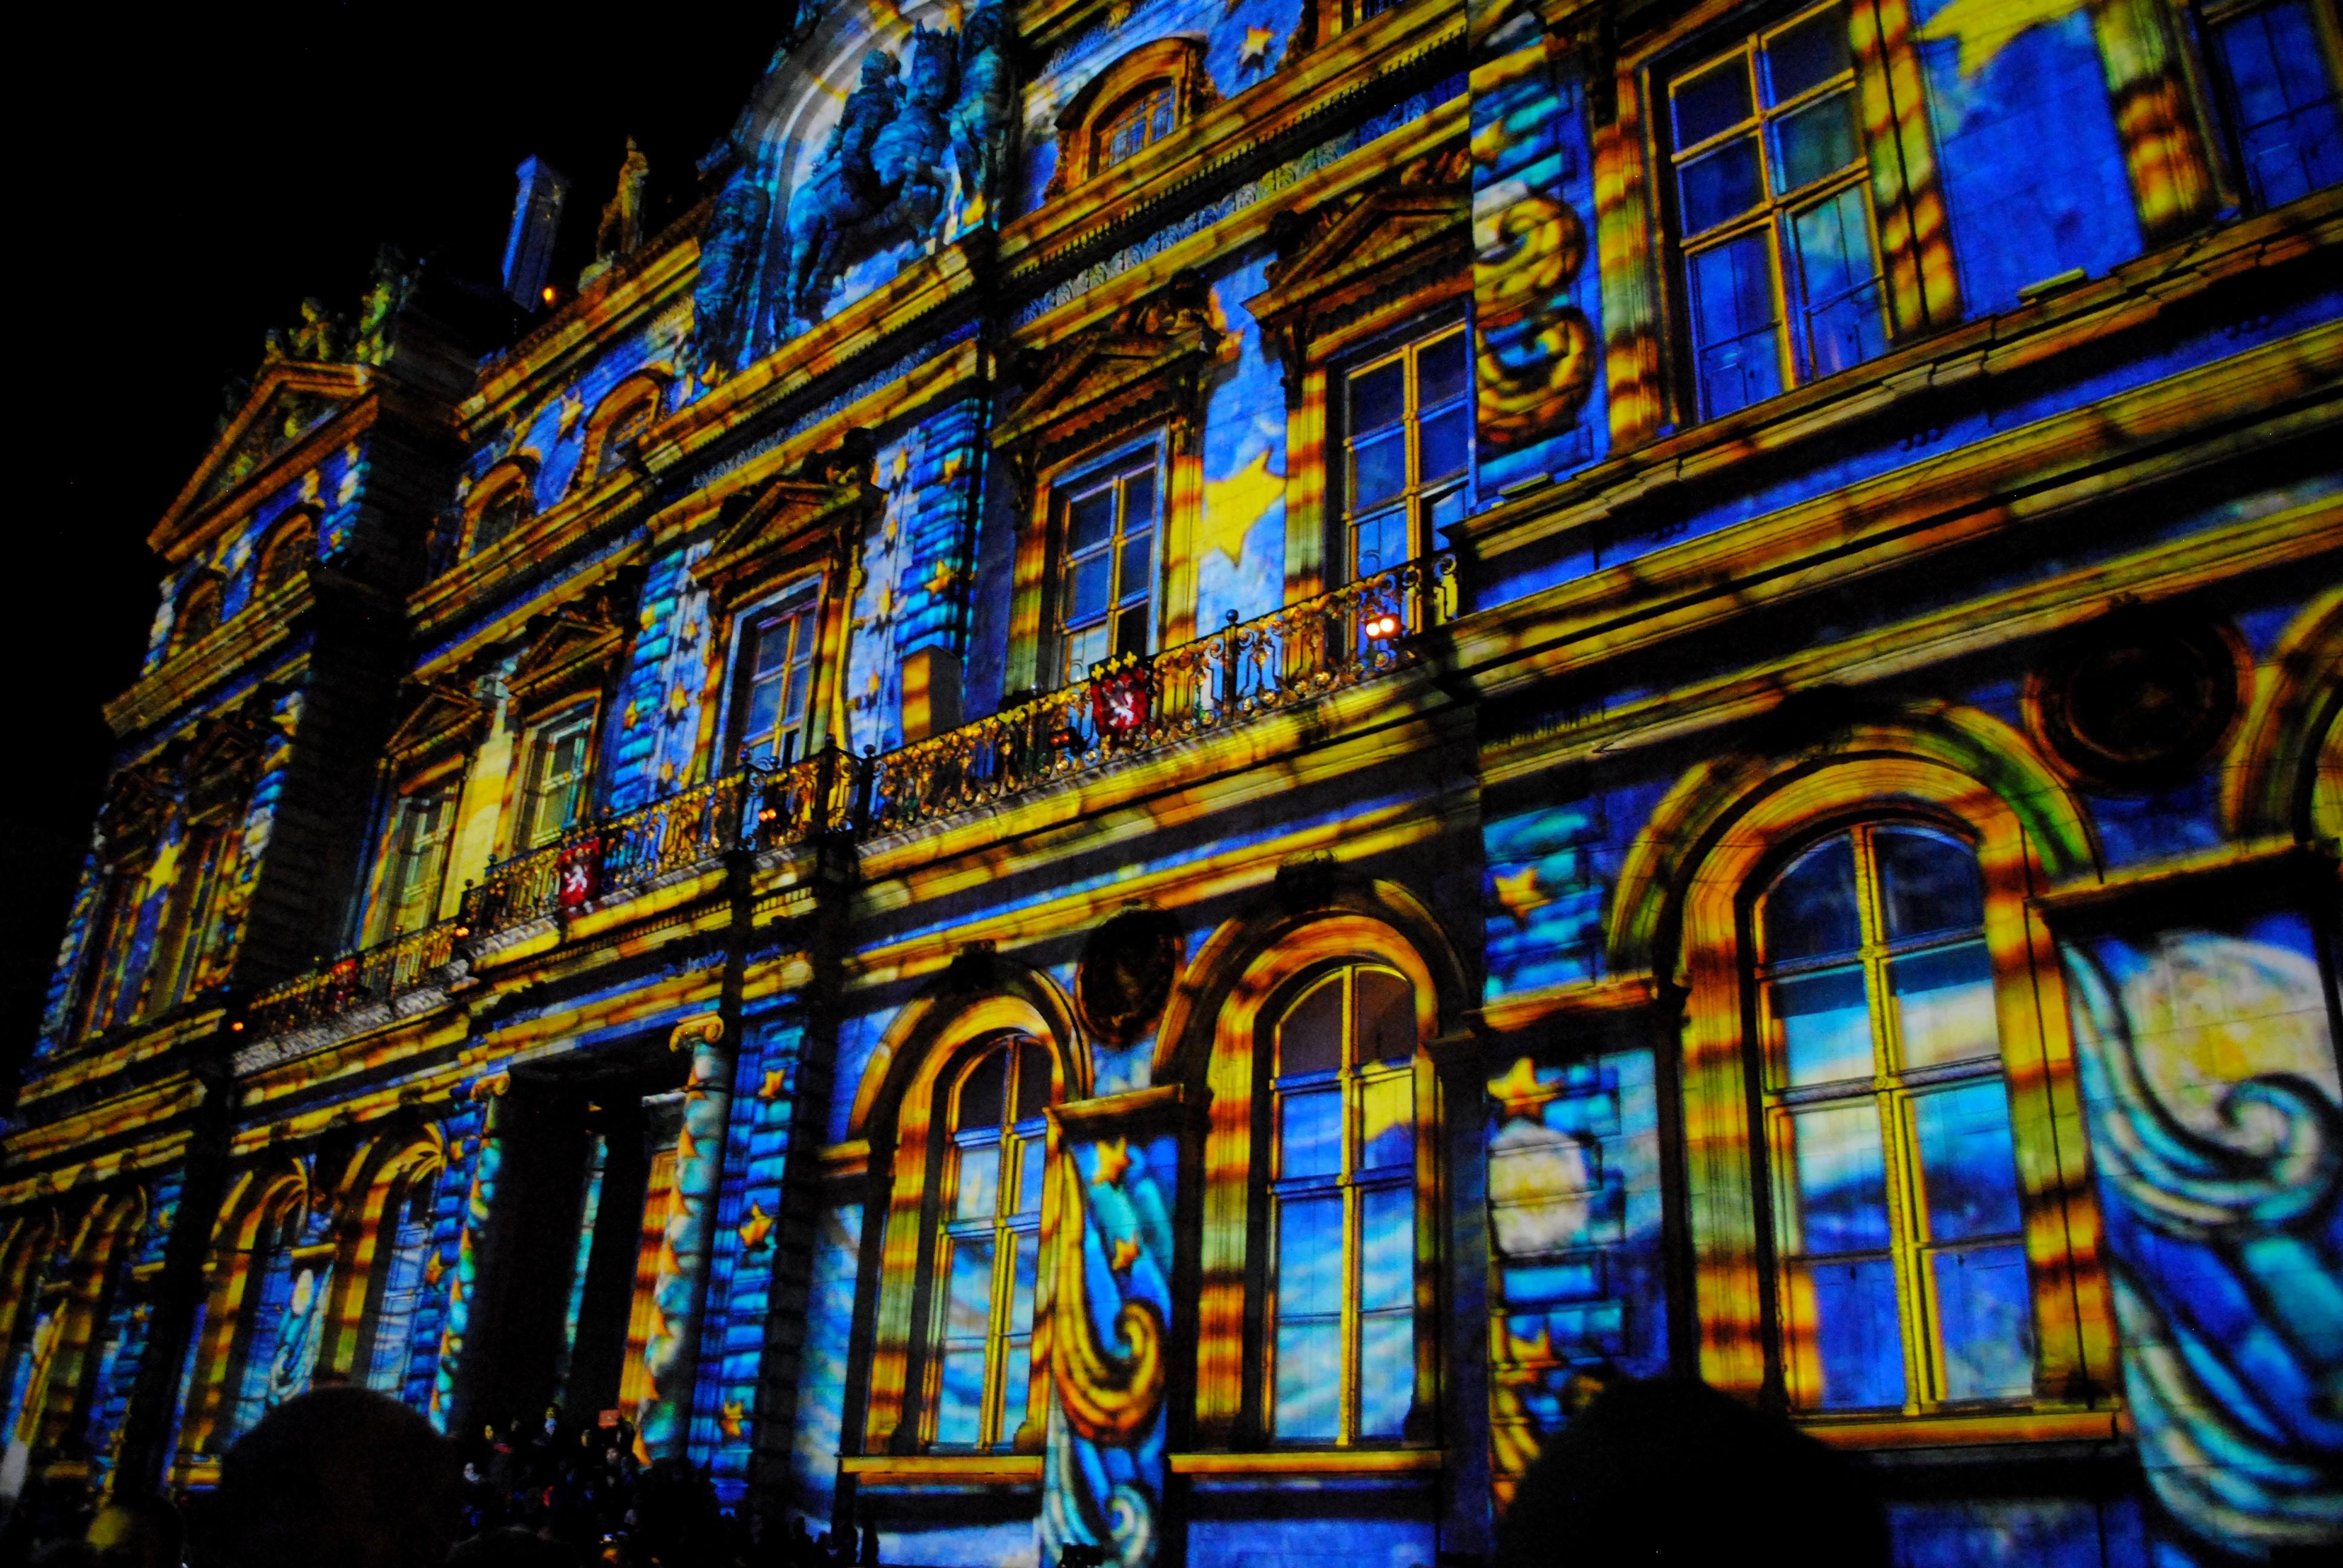 Fête des Lumières - Lyon  - www.MyFrenchLife.org